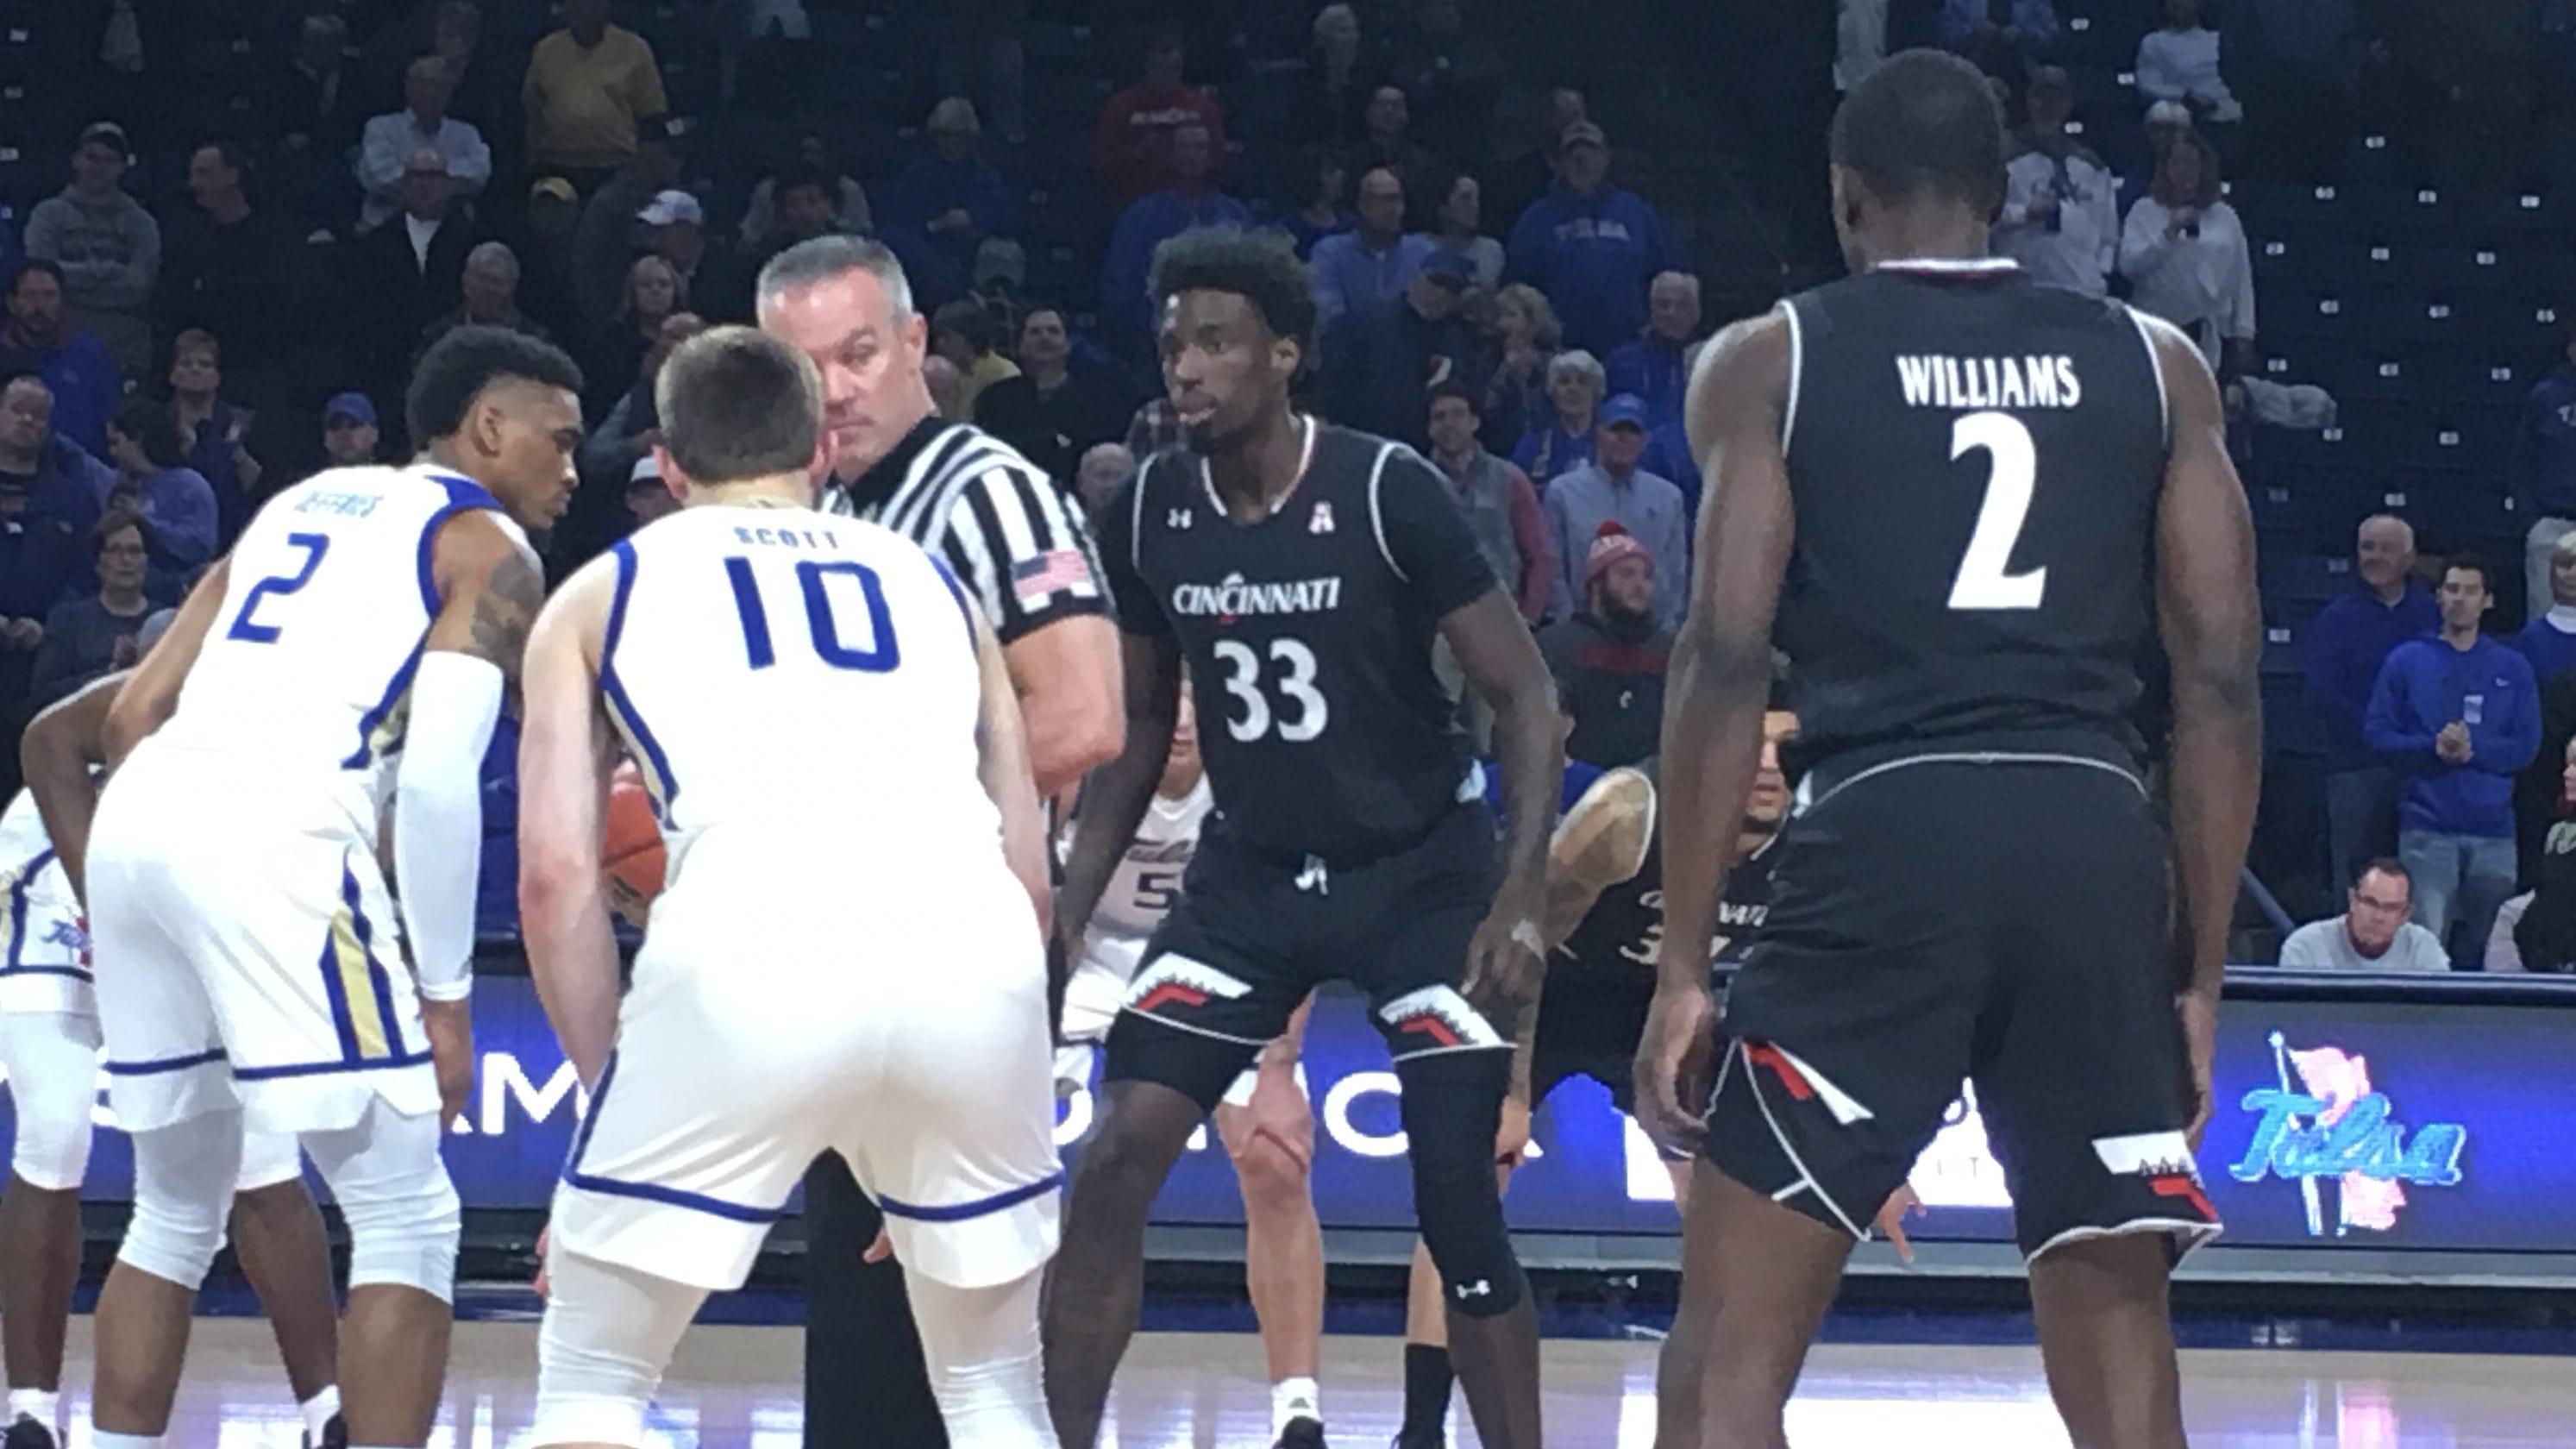 sale retailer 57a84 a0ee9 2019 UC Basketball: Bearcats win OT over Tulsa